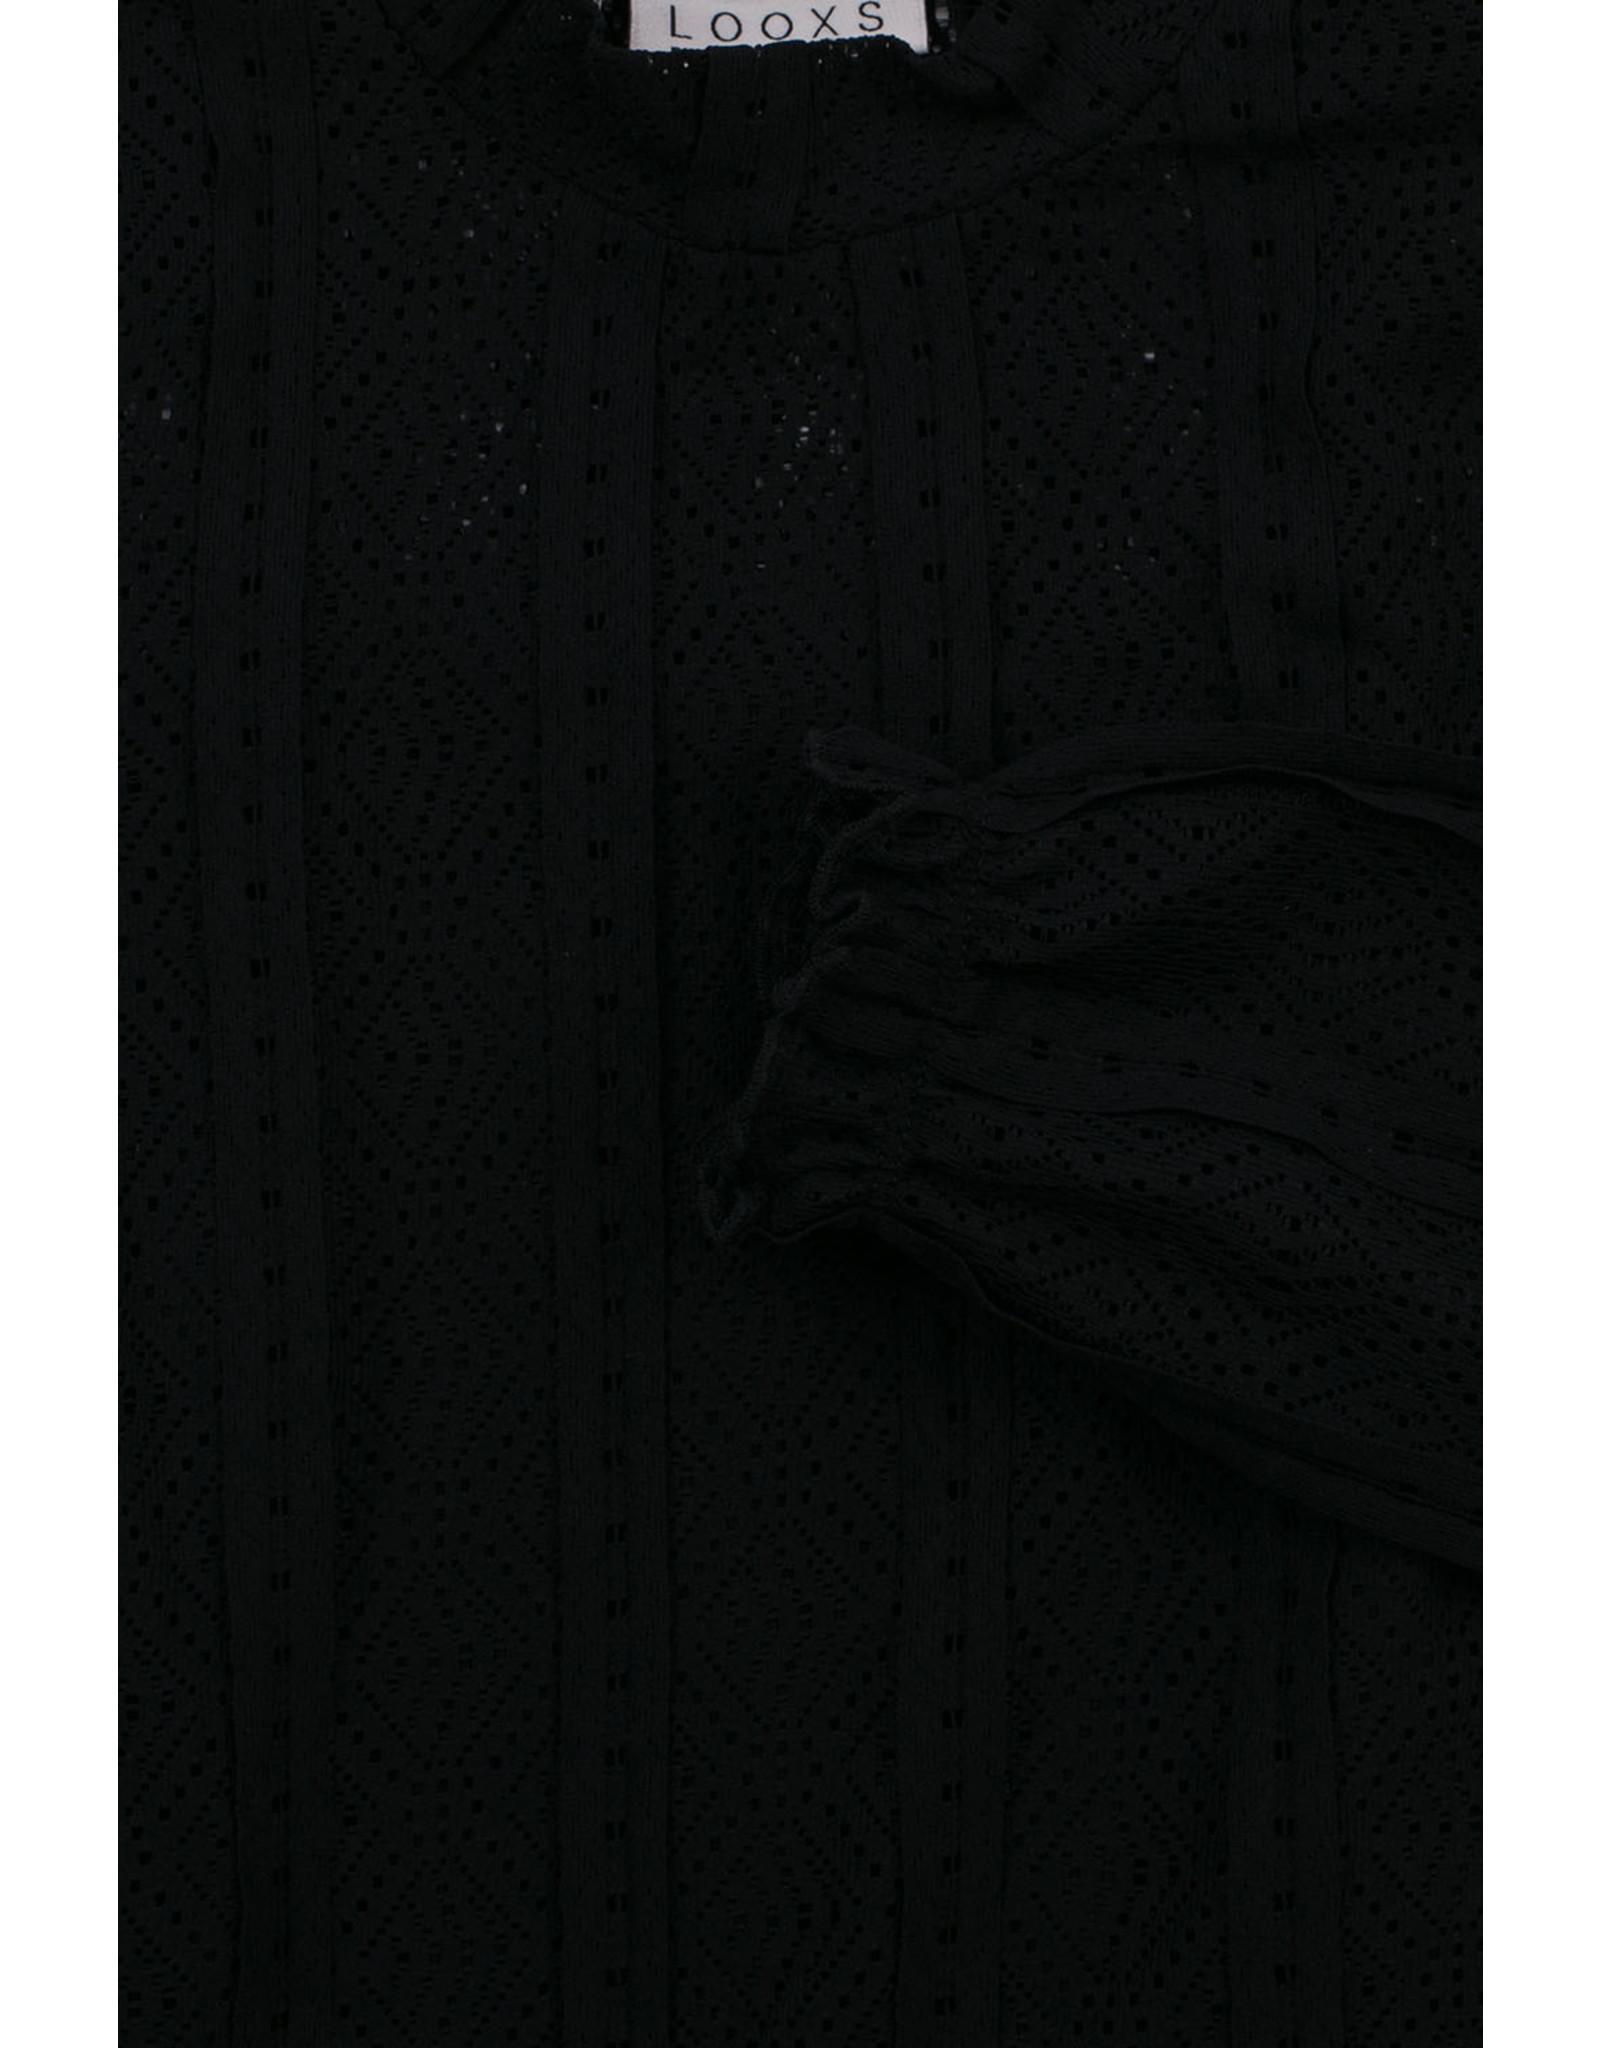 LOOXS 10sixteen 10Sixteen lace top, off black